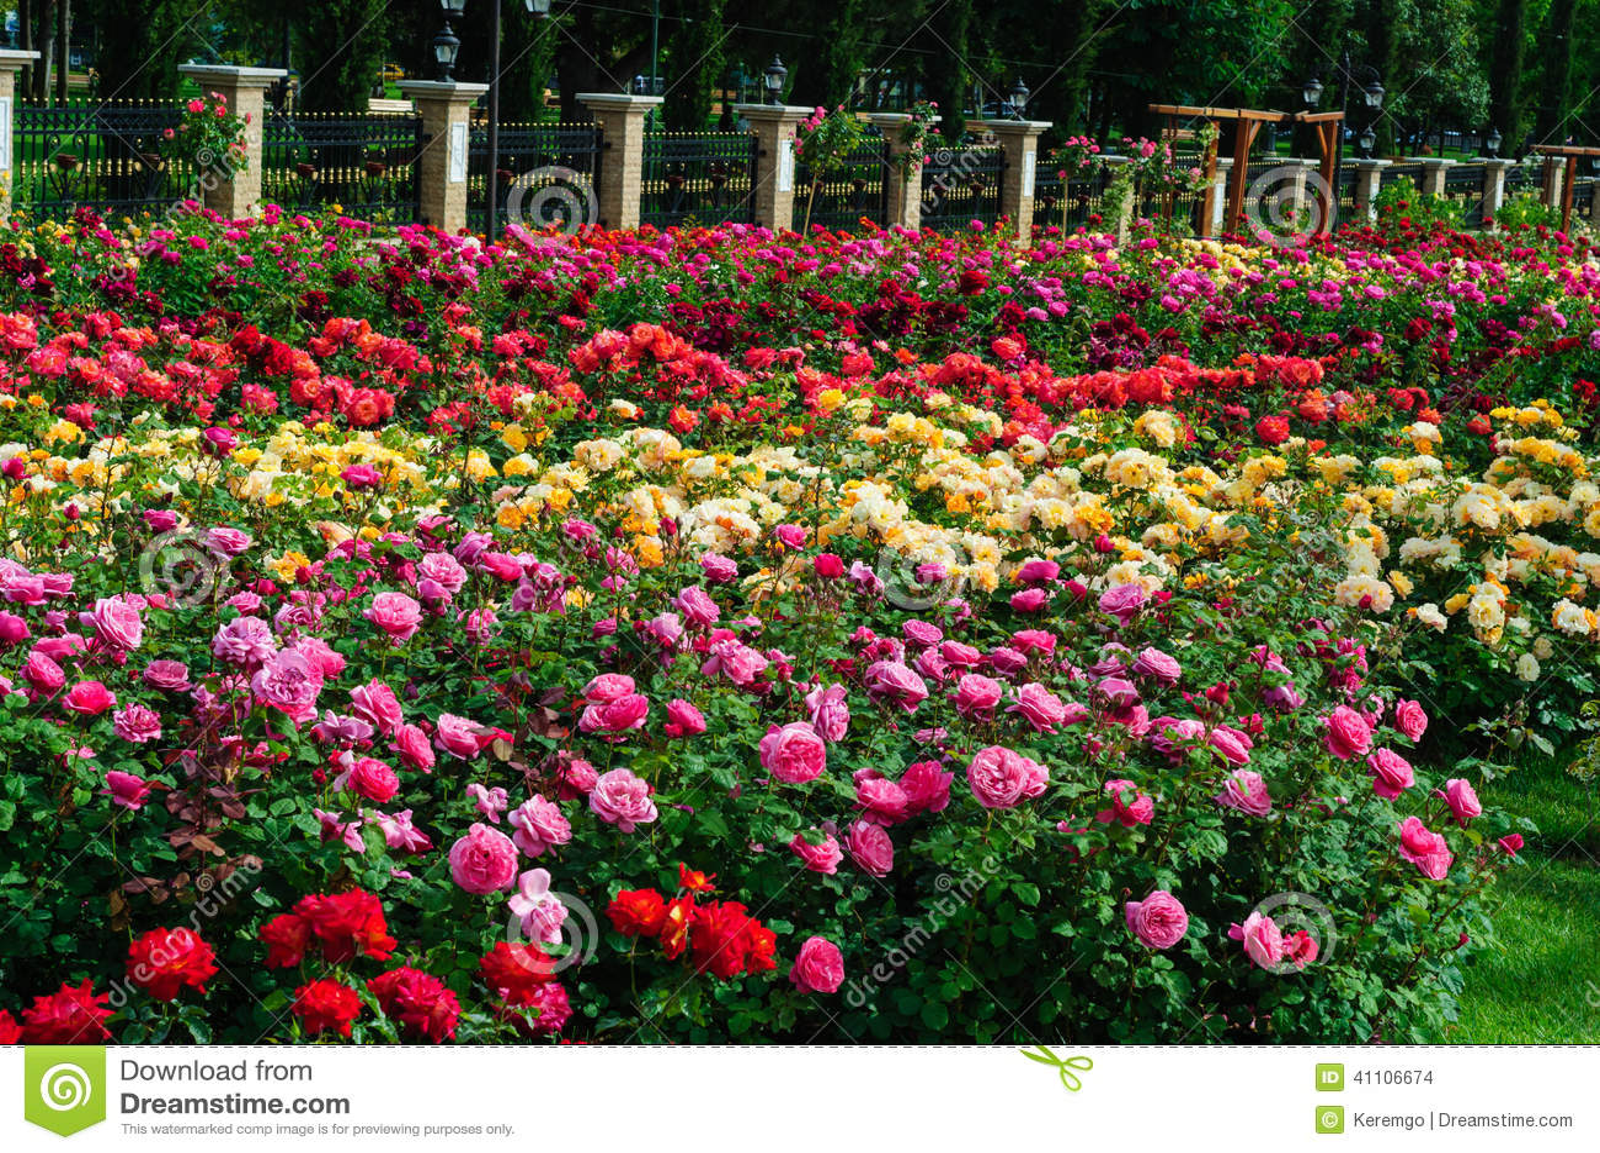 Large Garden Full Of Roses Garden Of Roses Stock Photo Image Of Native Beauty 41106674